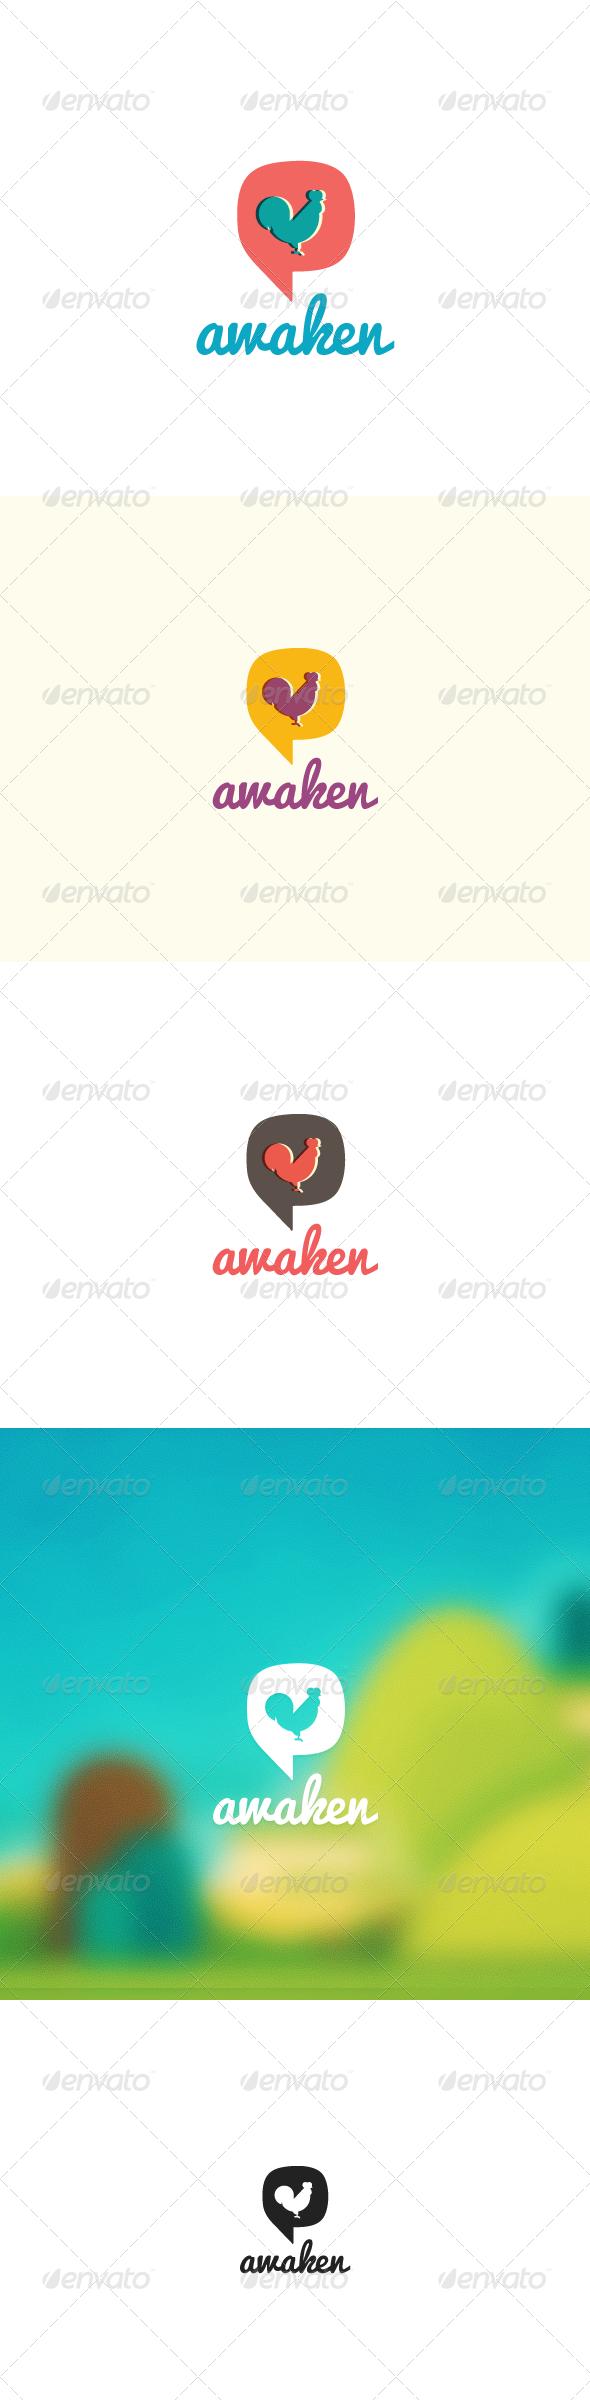 Awaken Logo - Animals Logo Templates